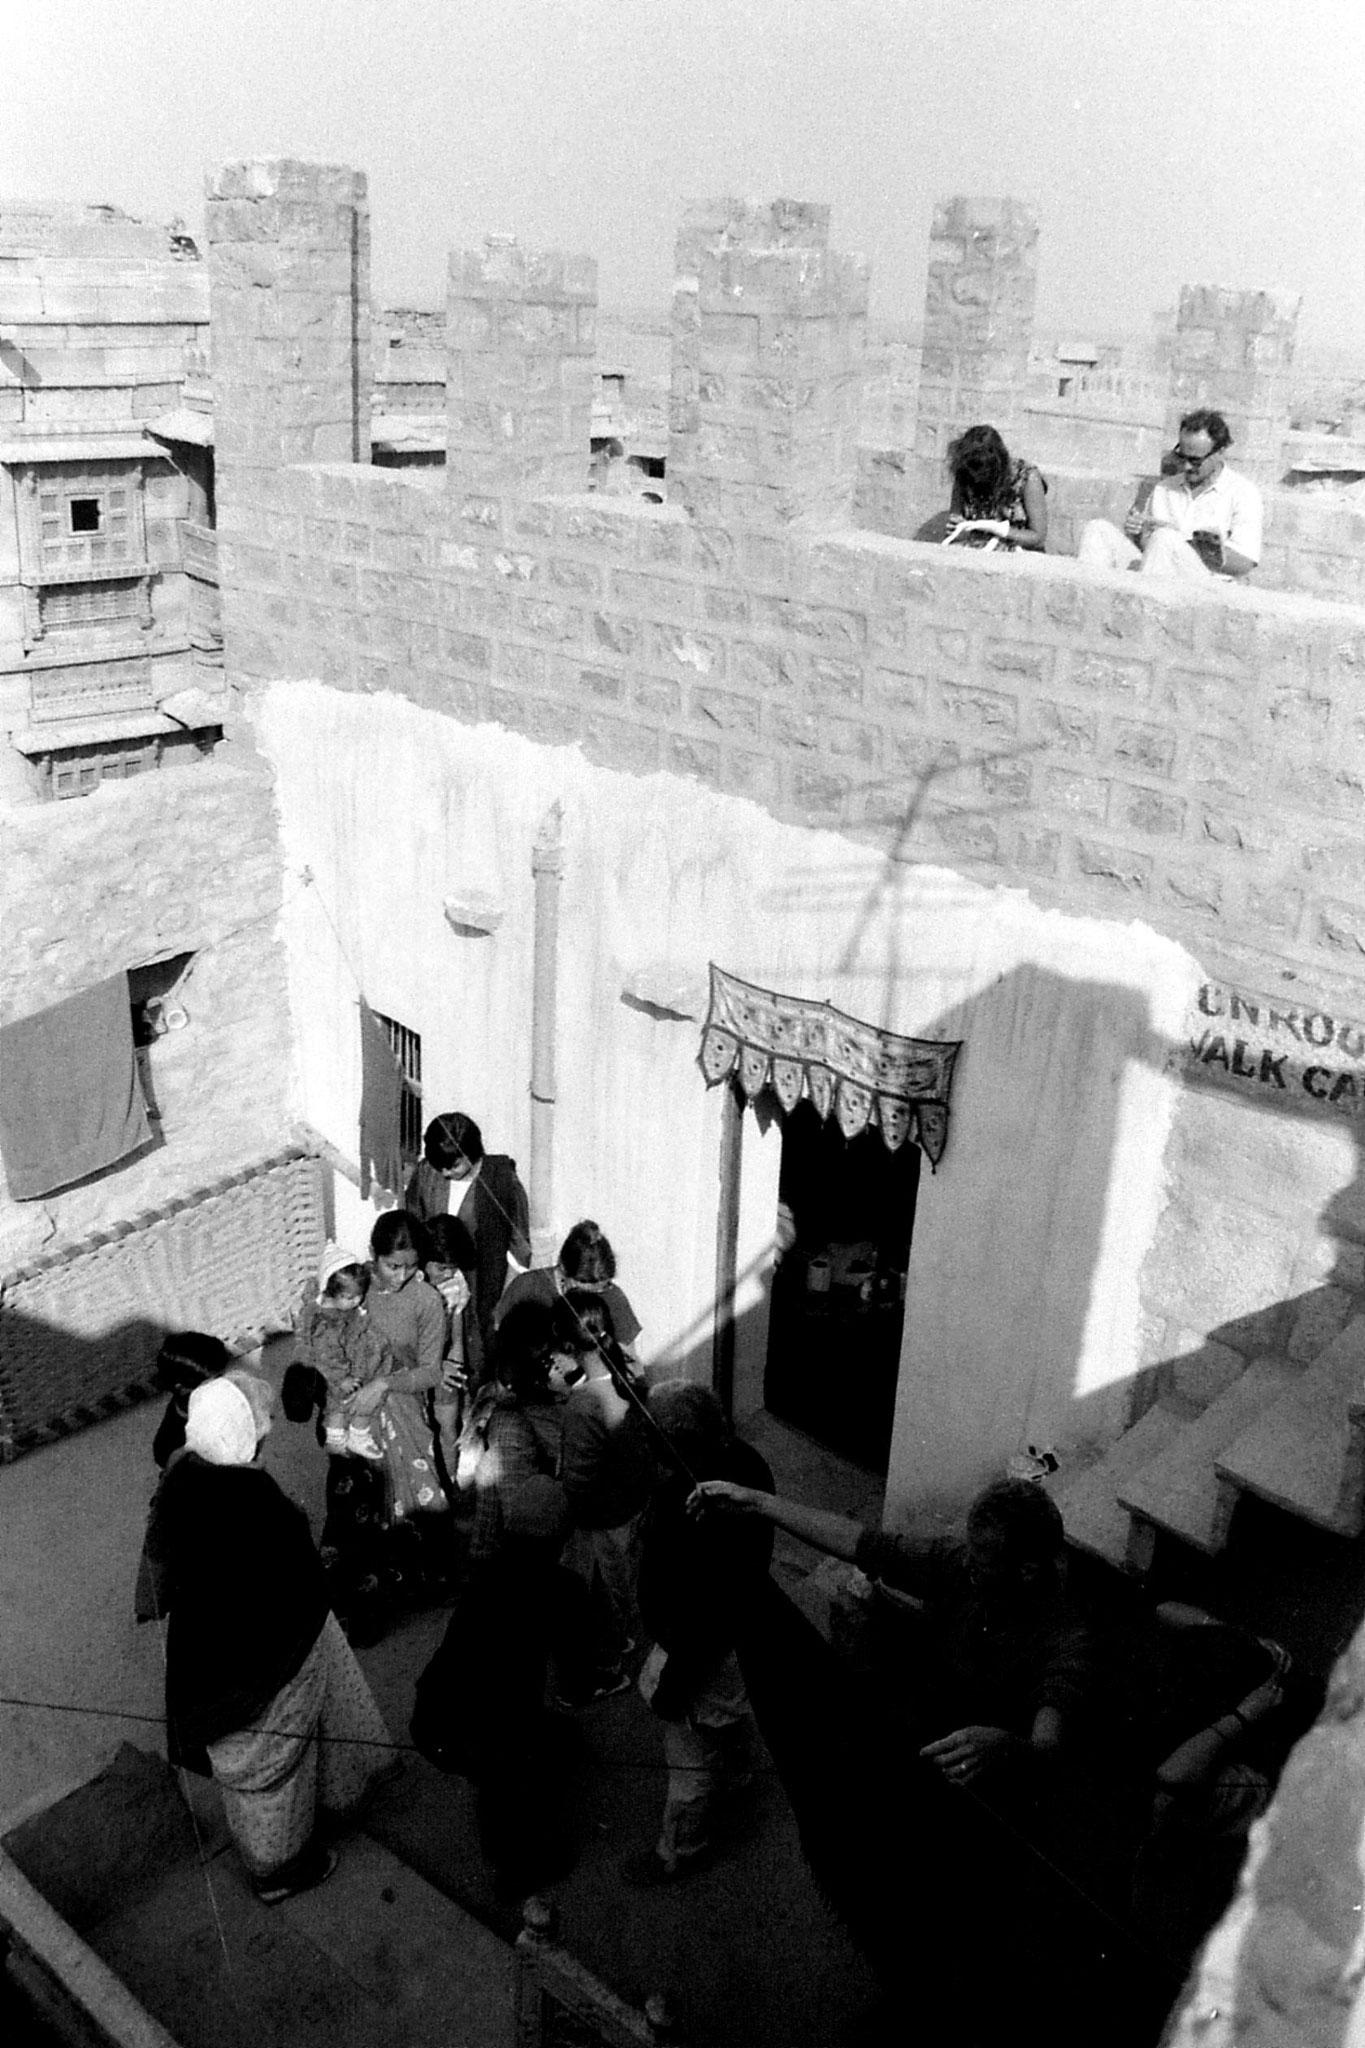 2/12/1989: 12: Jaisalmer, Elizabeth having her picture taken outside our room